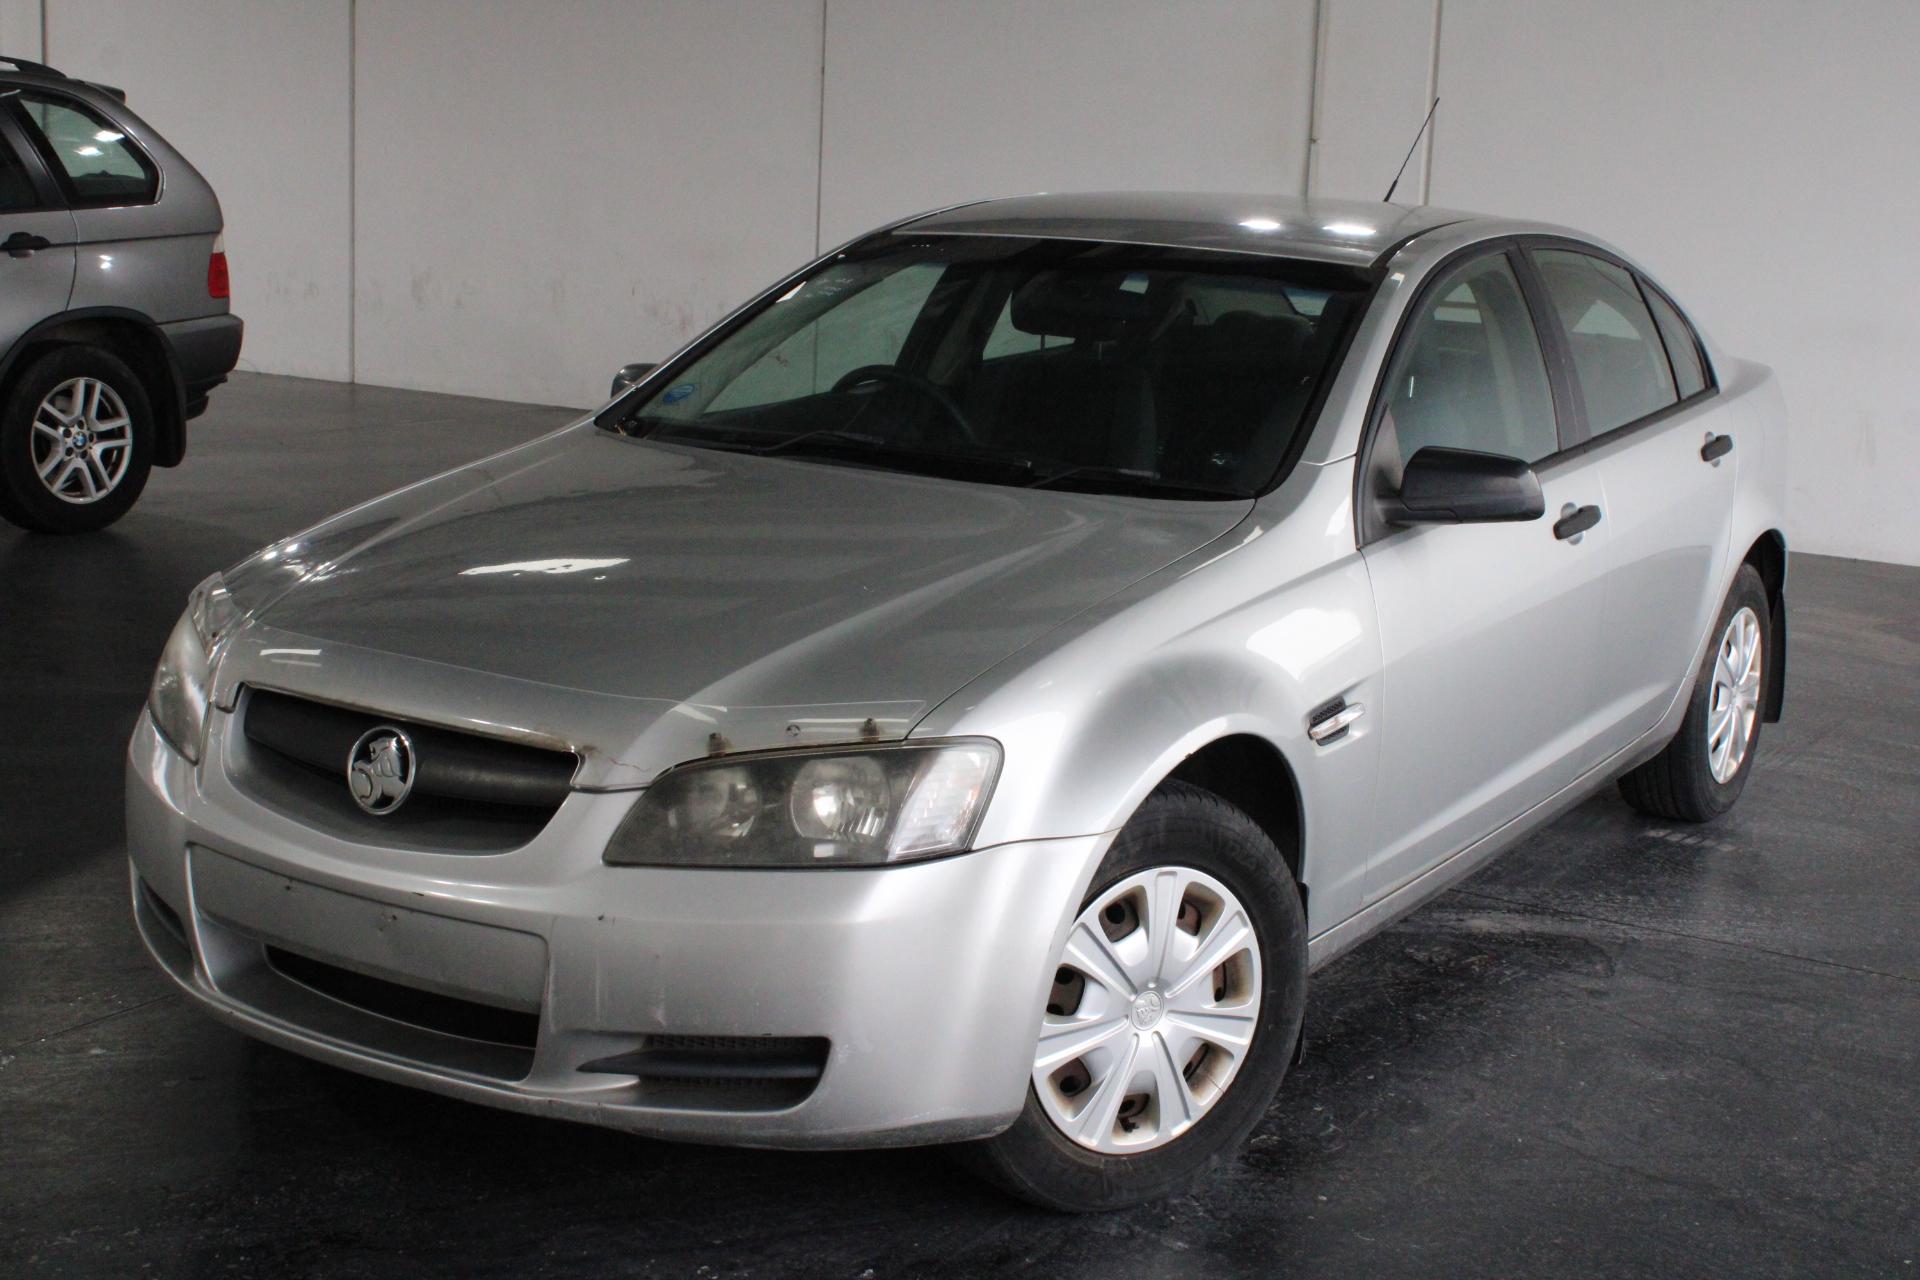 2007 Holden Commodore Omega VE Automatic Sedan